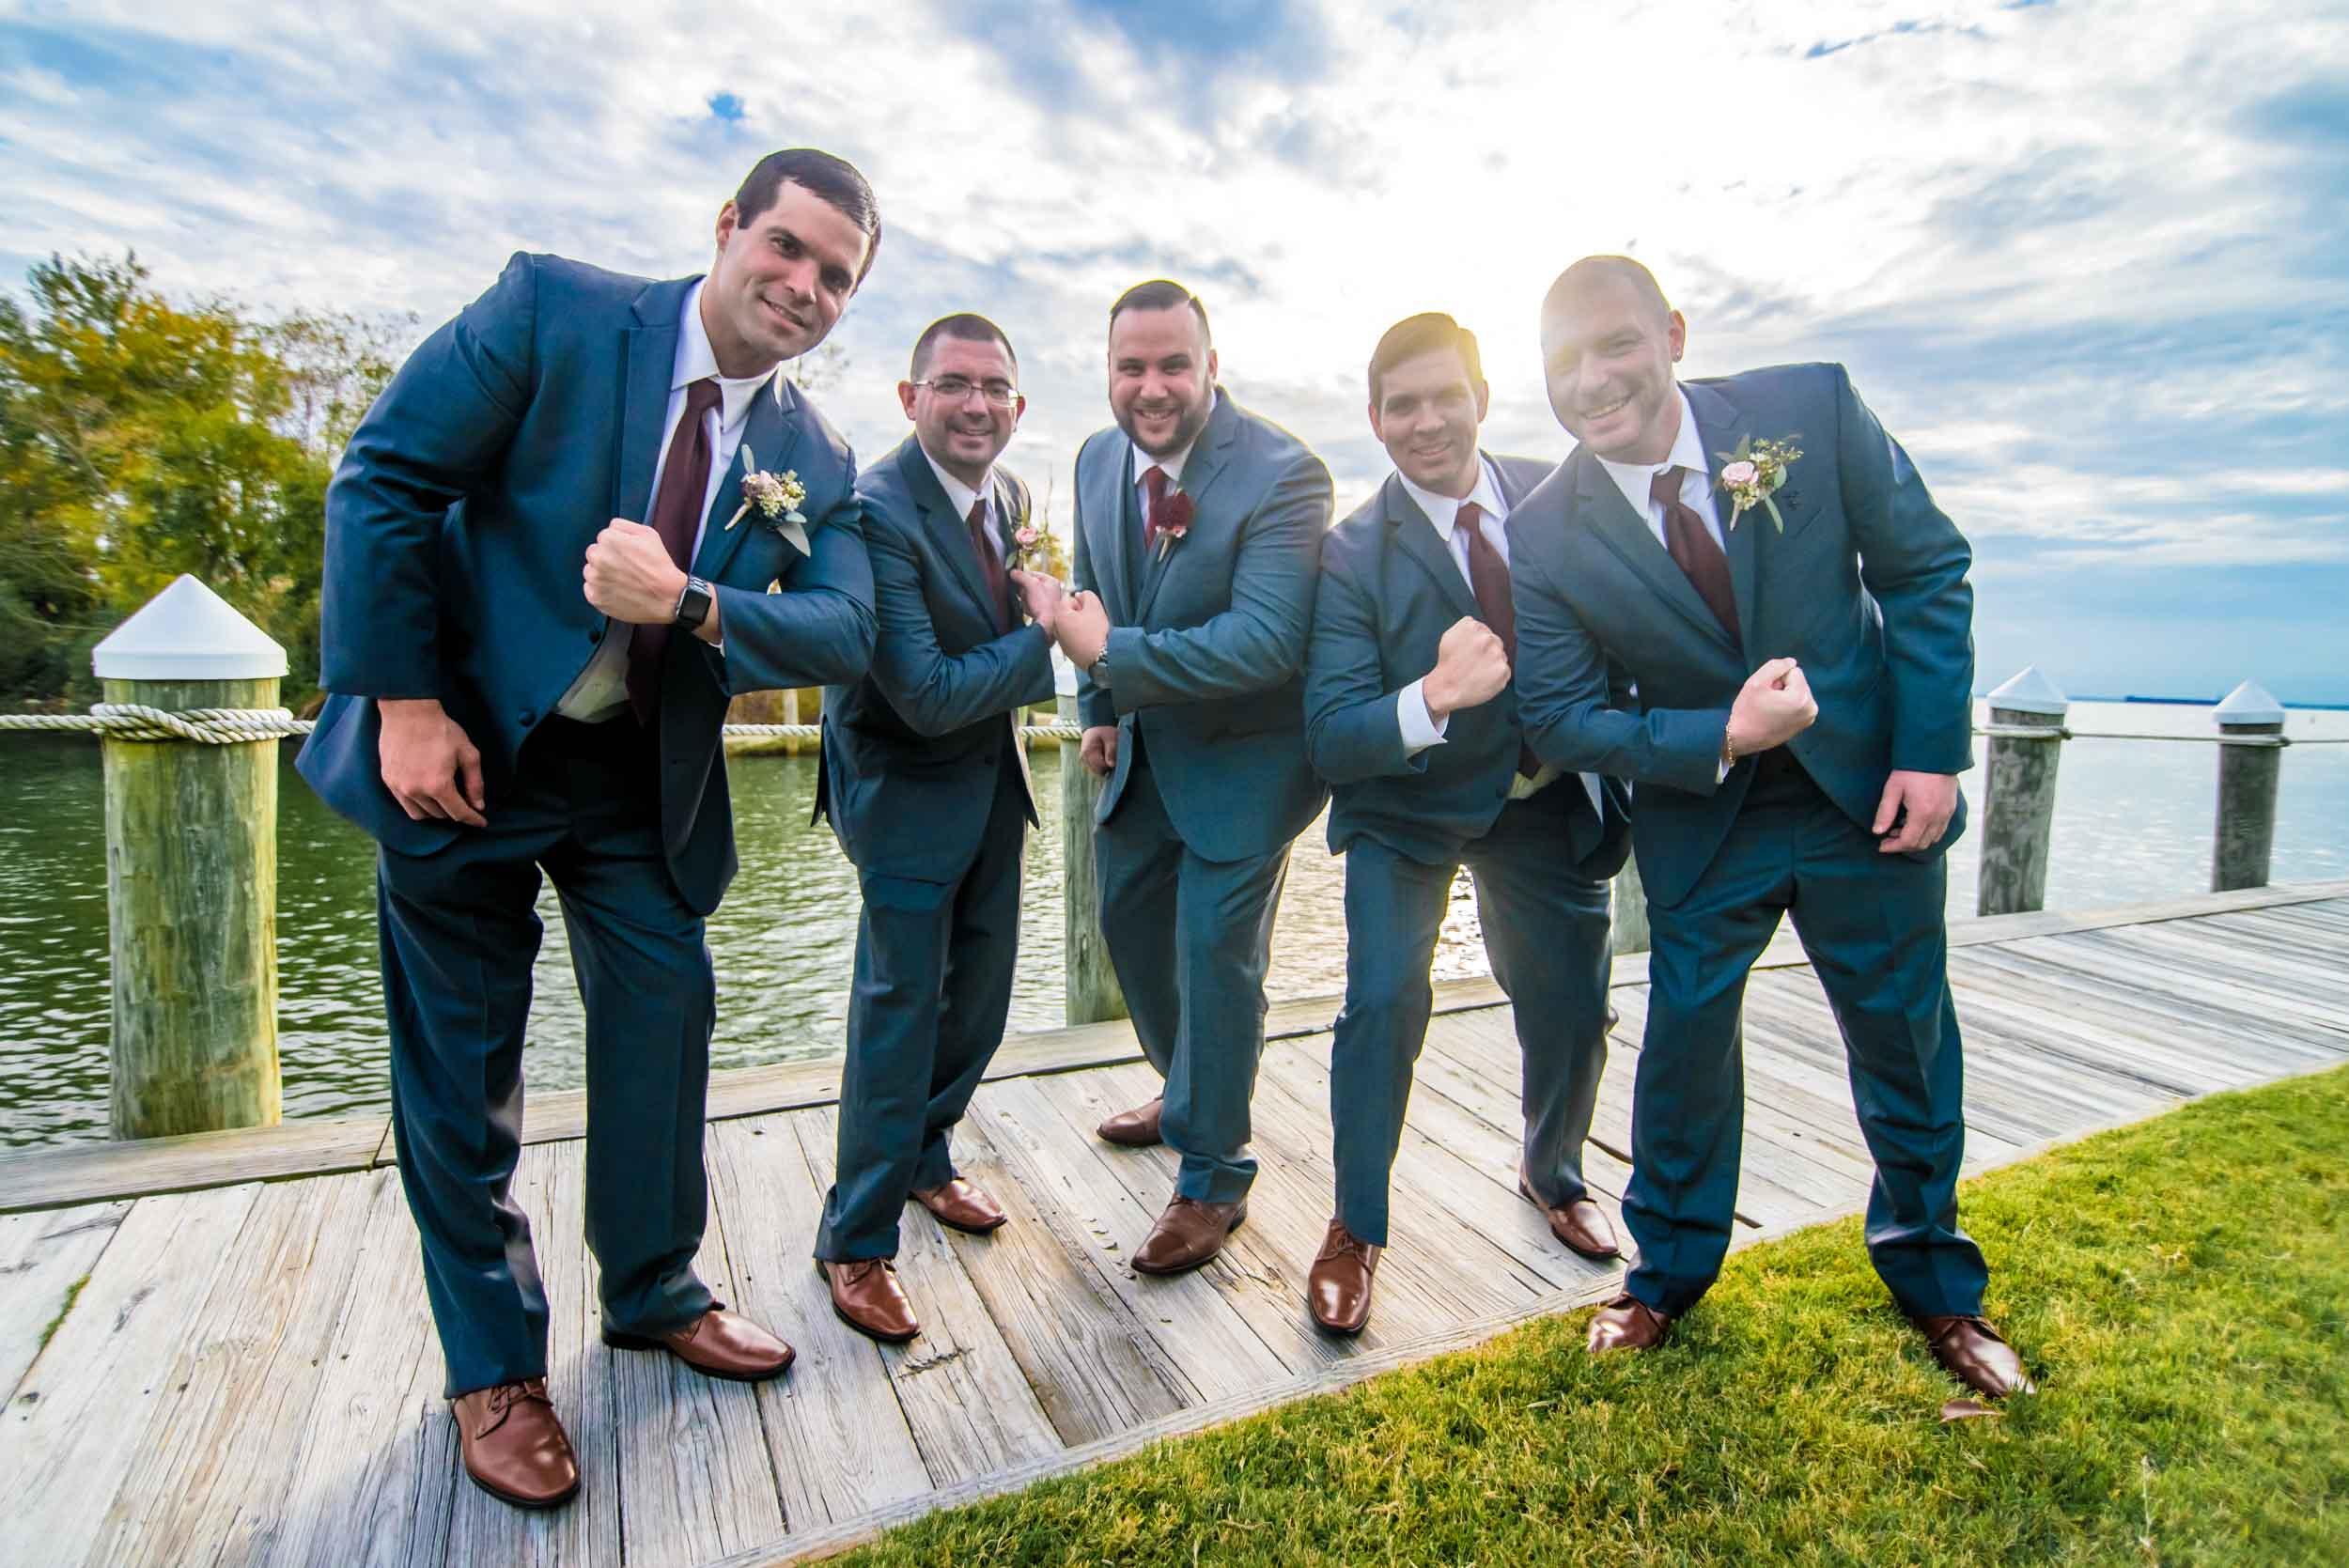 dc+metro+wedding+photographer+vadym+guliuk+photography+weddings+groomsmen-2029.jpg